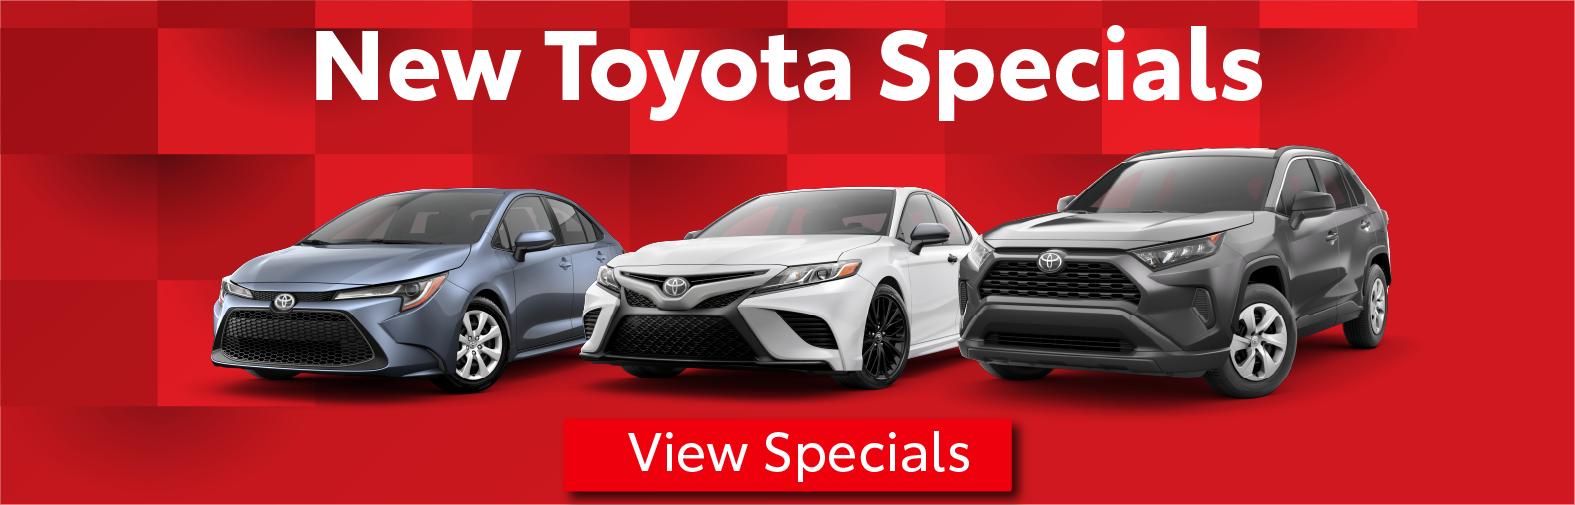 Midtown Toyota Vehicle Specials